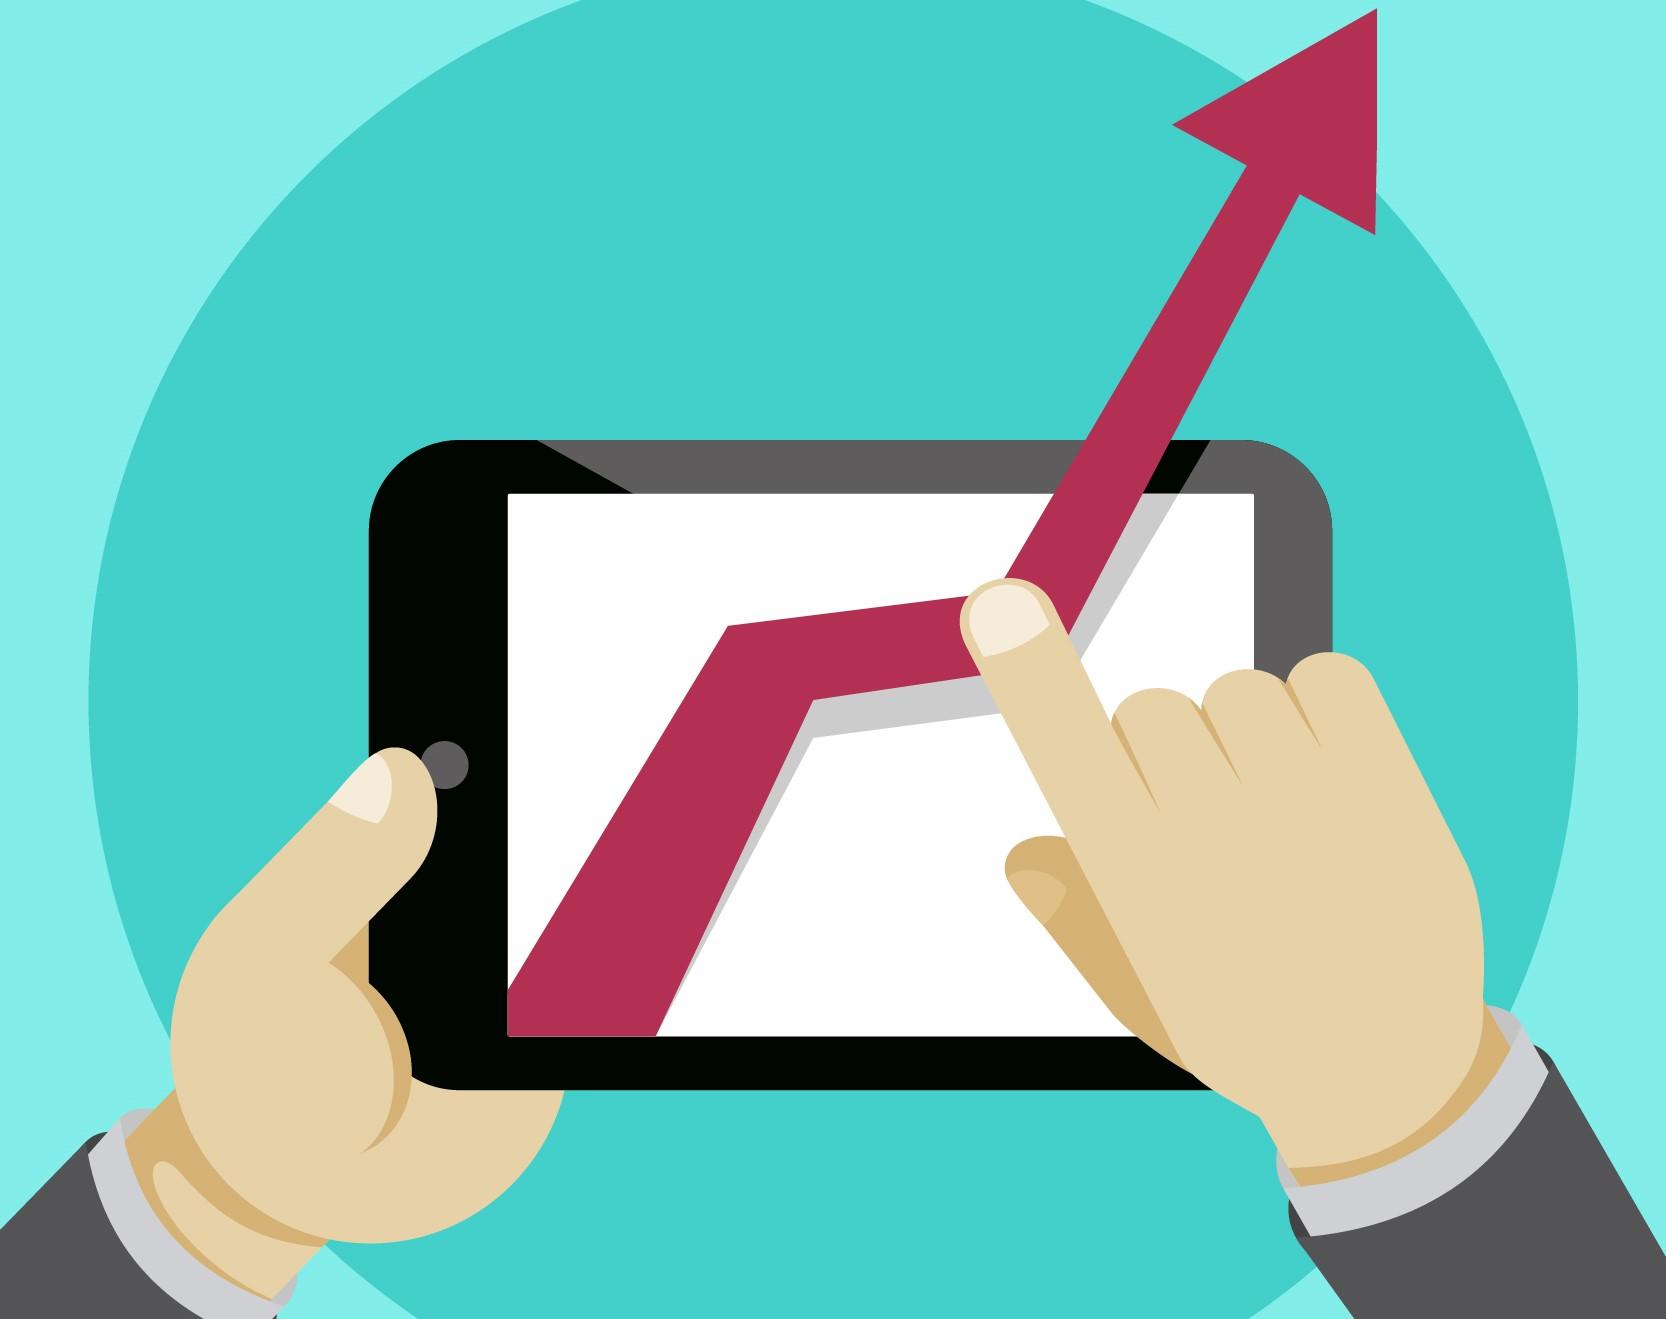 b2b five times more revenue growth